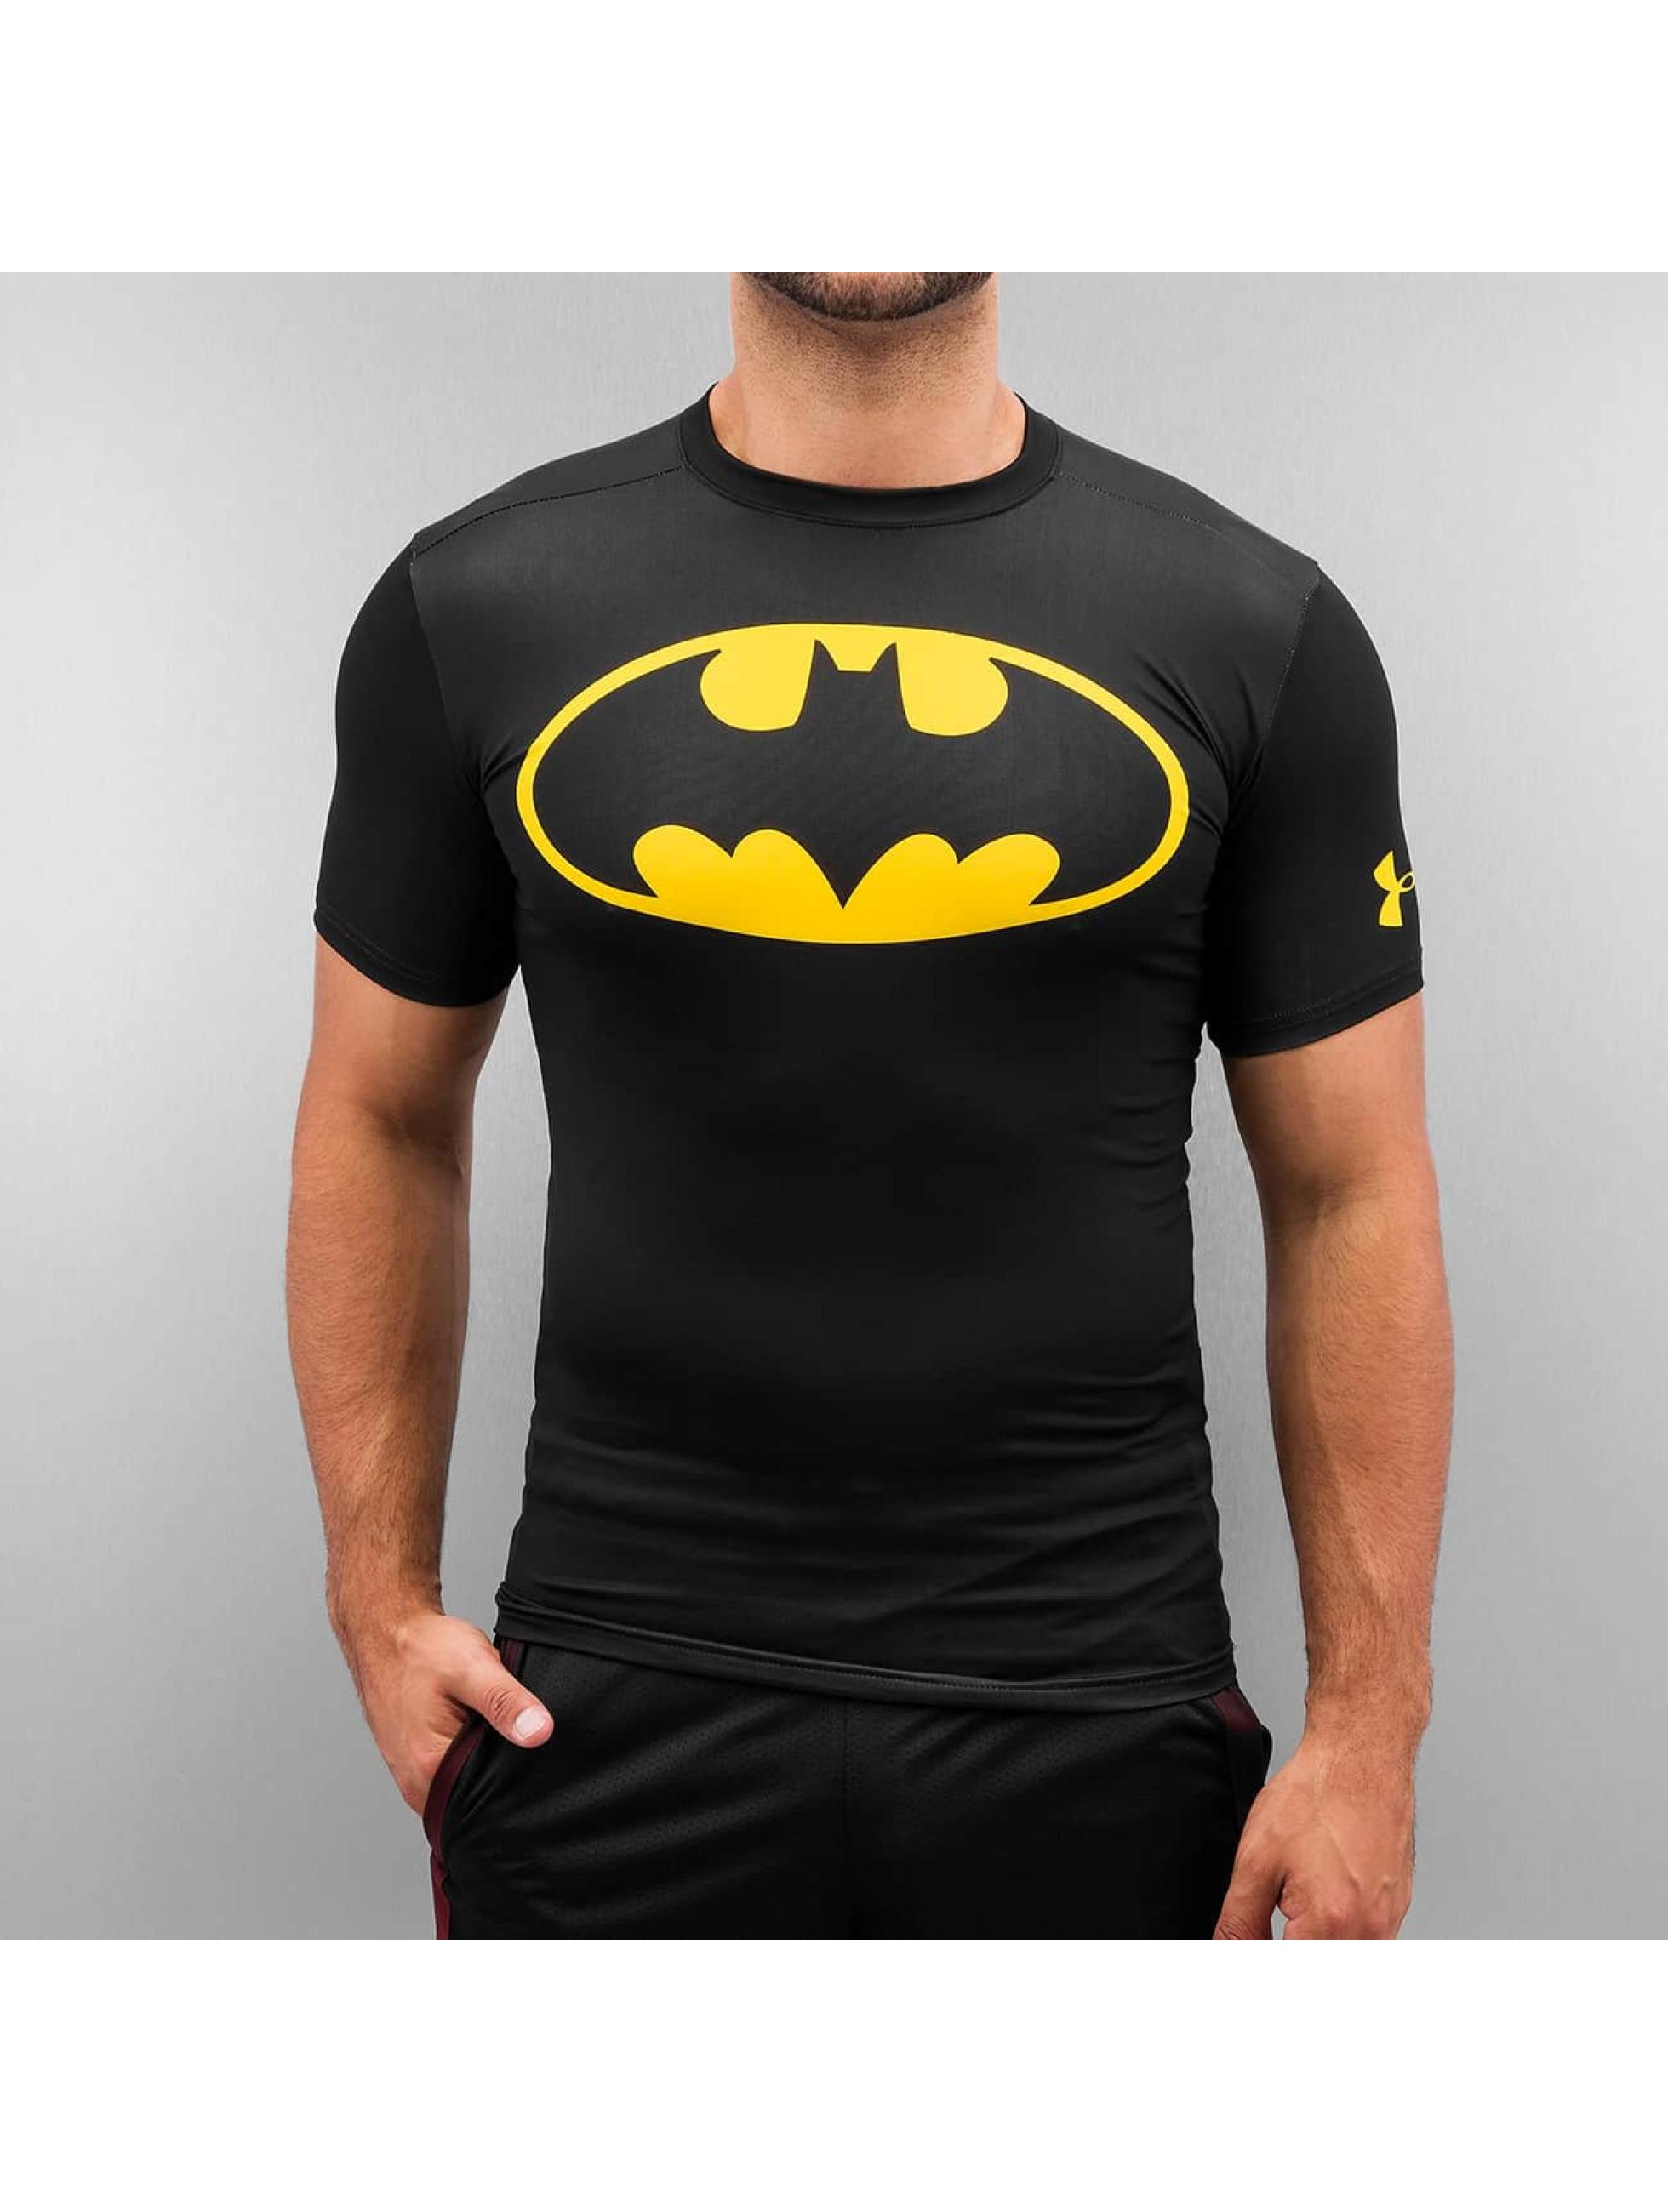 Under armour herren t shirt alter ego batman compression for Original under armour shirt